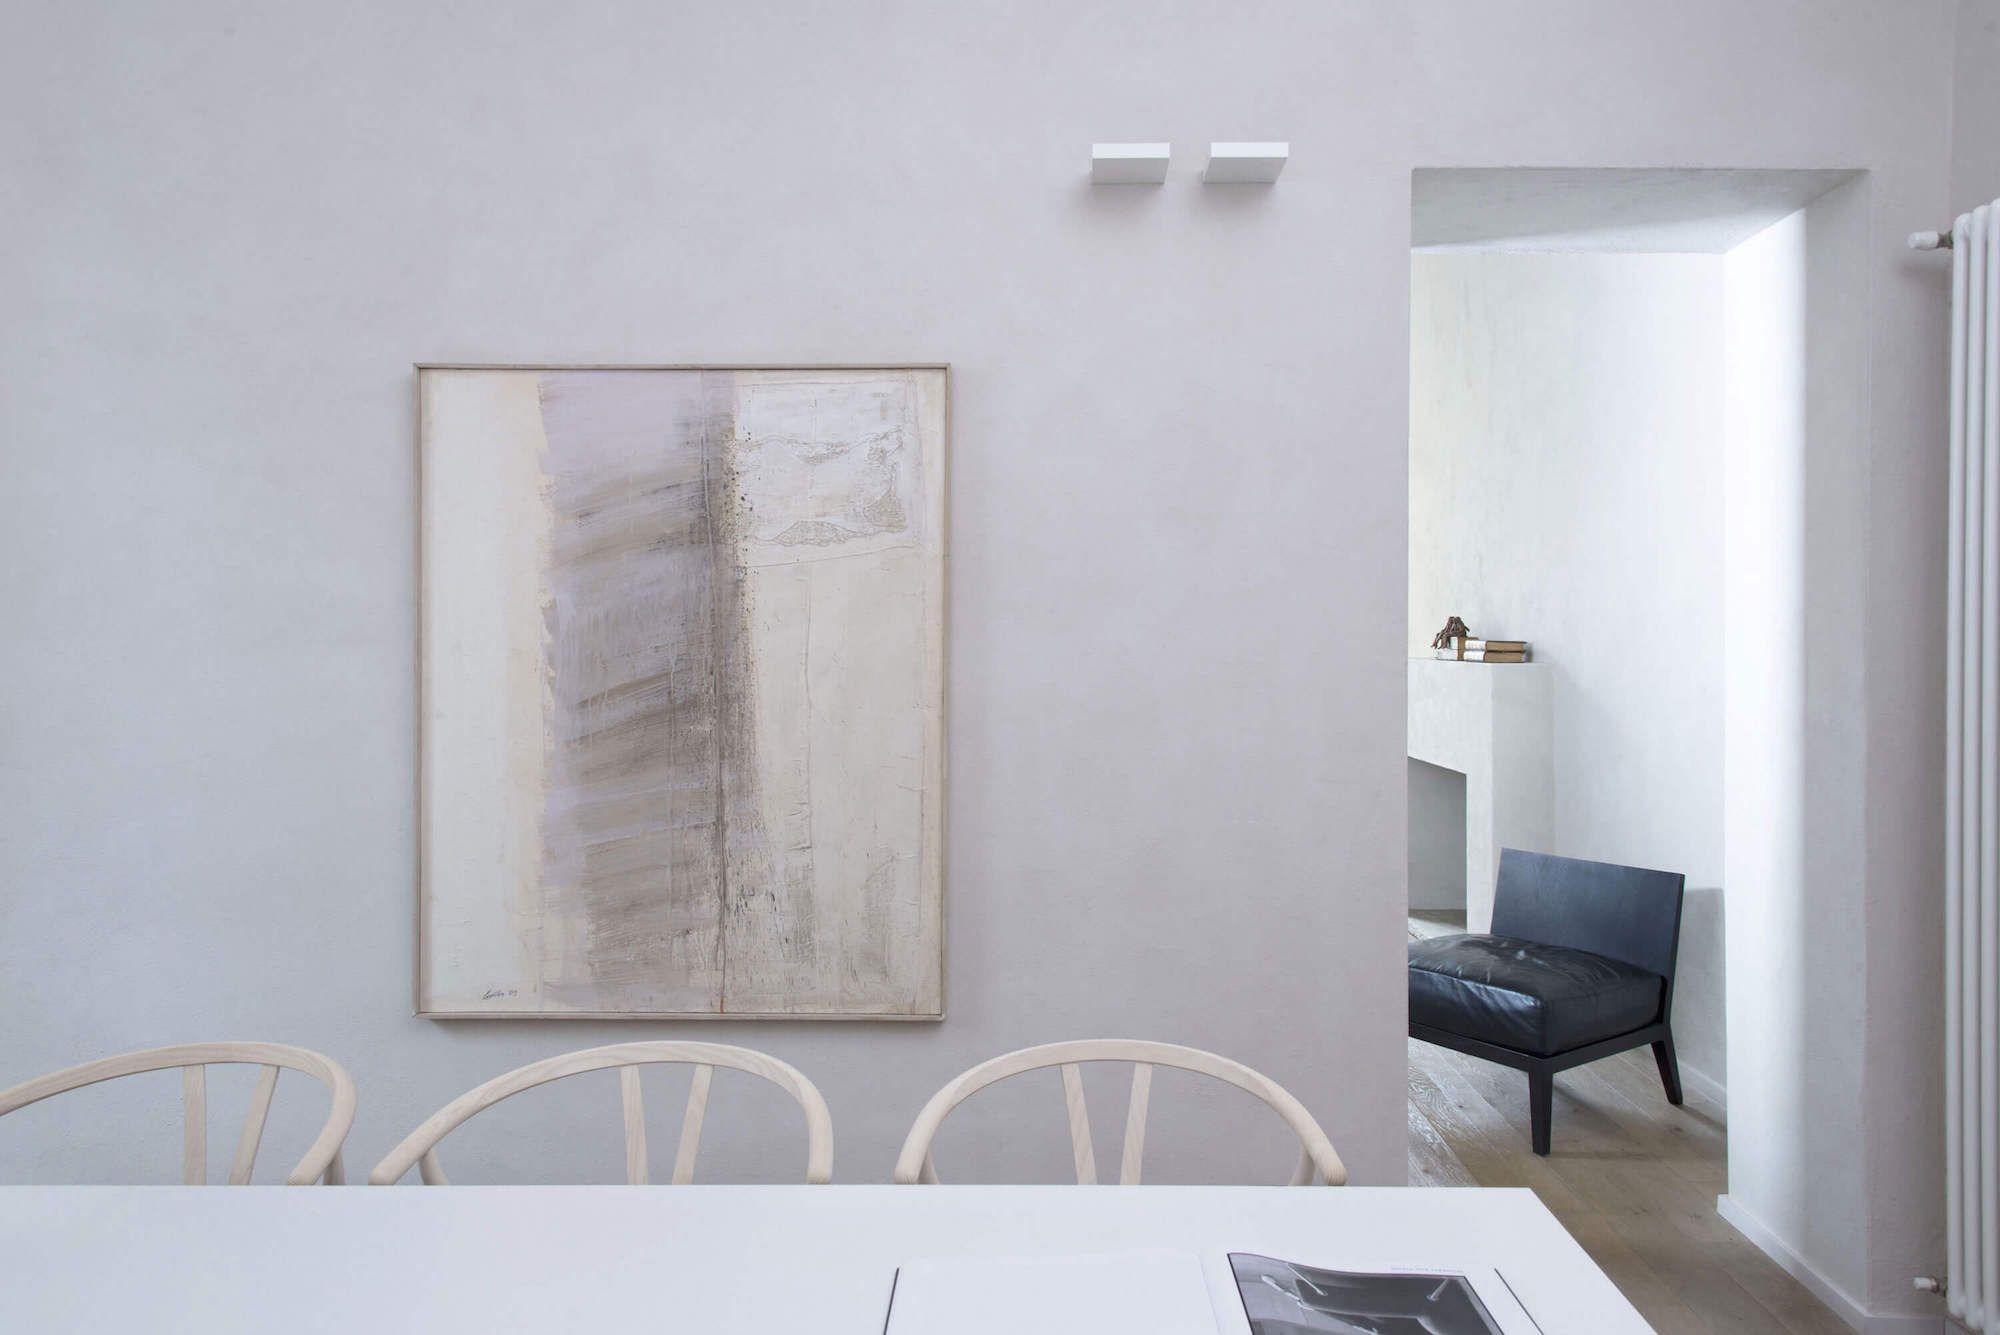 apartment-piacenza-studio-blesi-subitoni-07